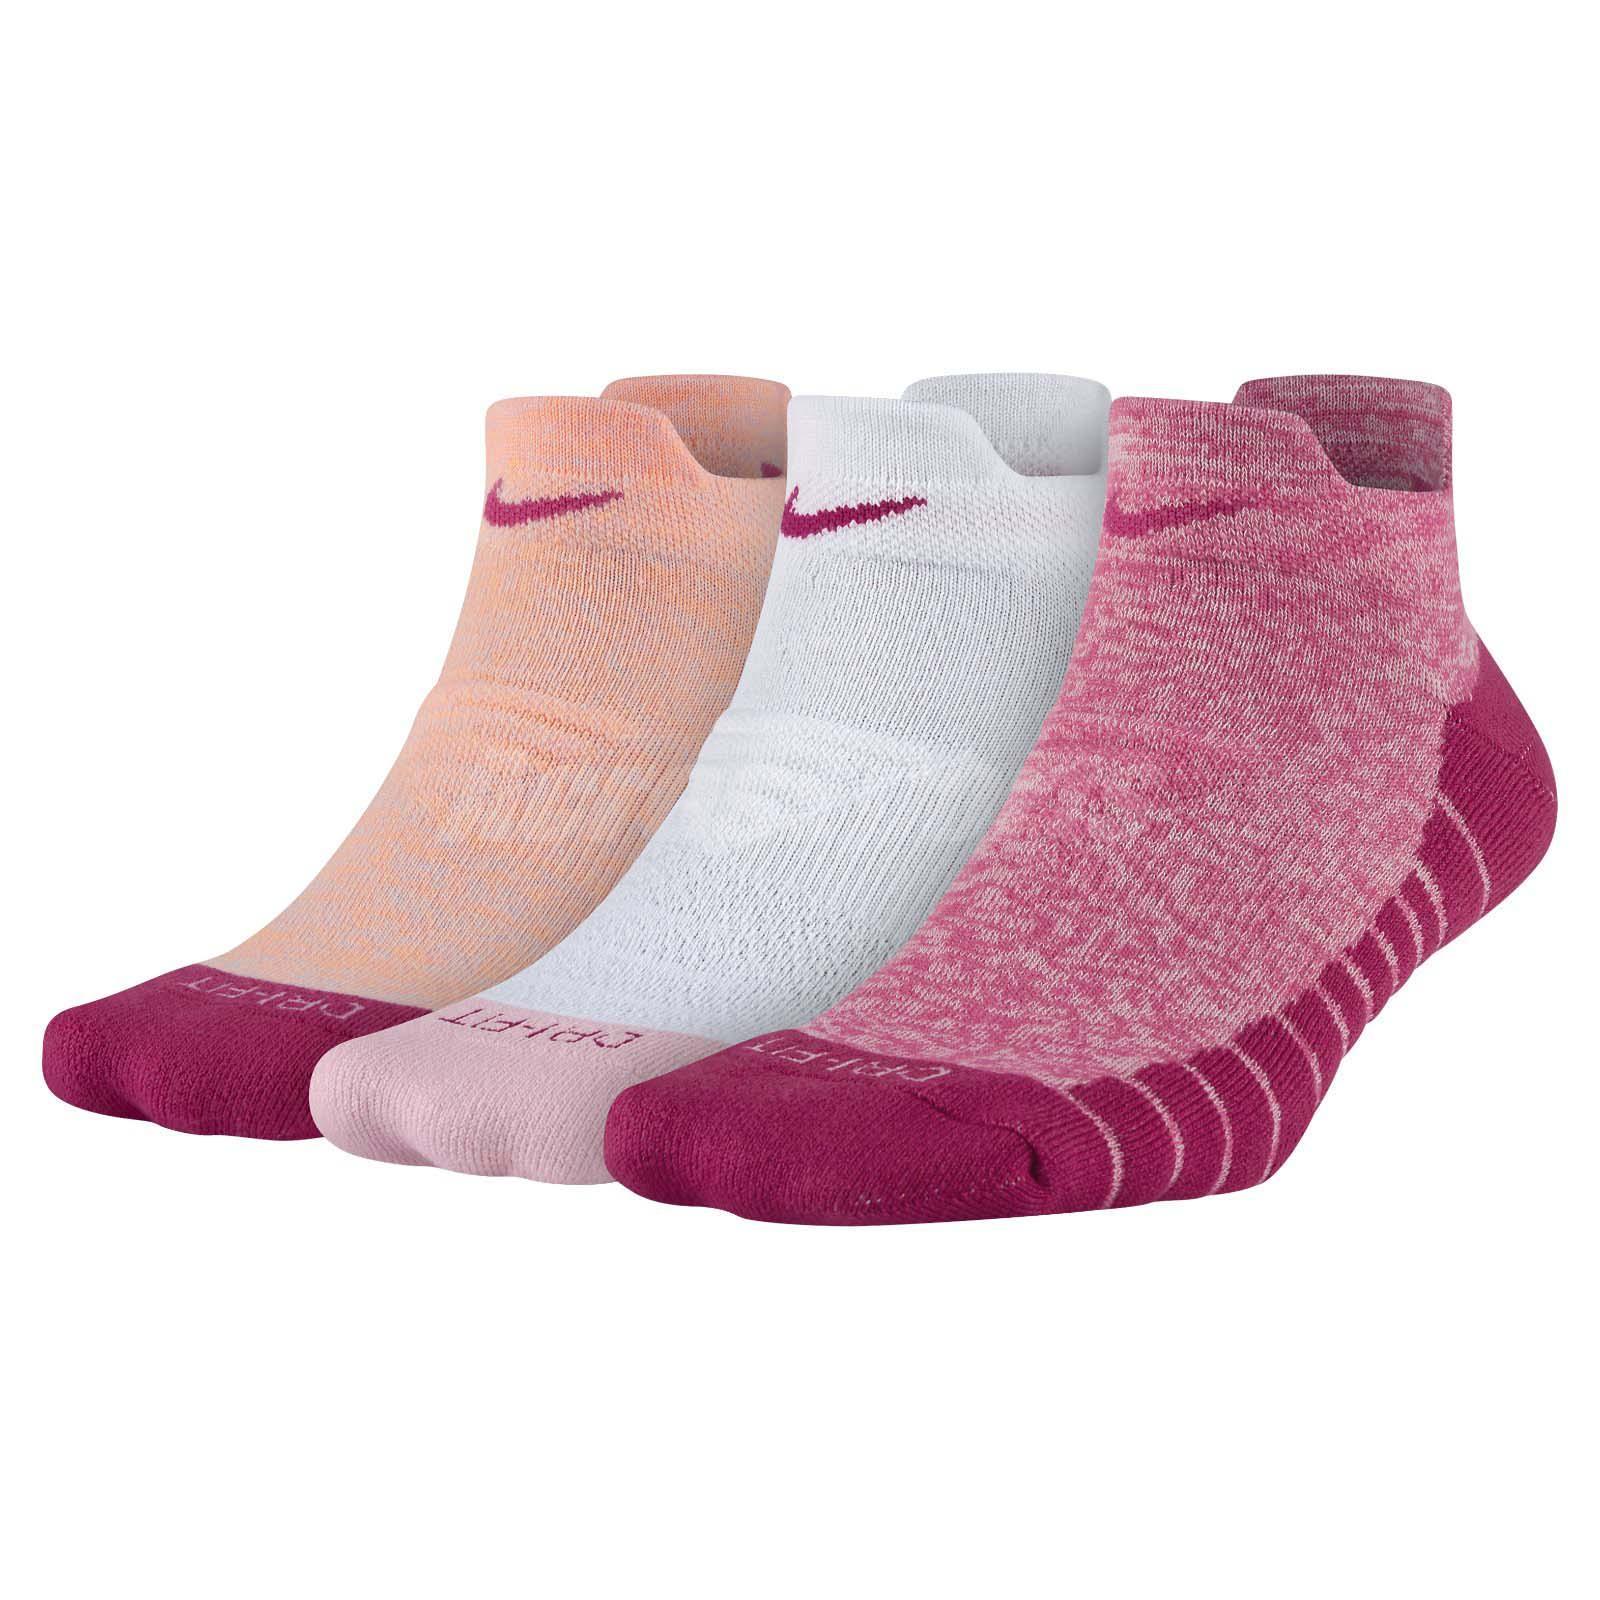 Peds  Women/'s Micro Acrylic No Show Socks 3 Pair